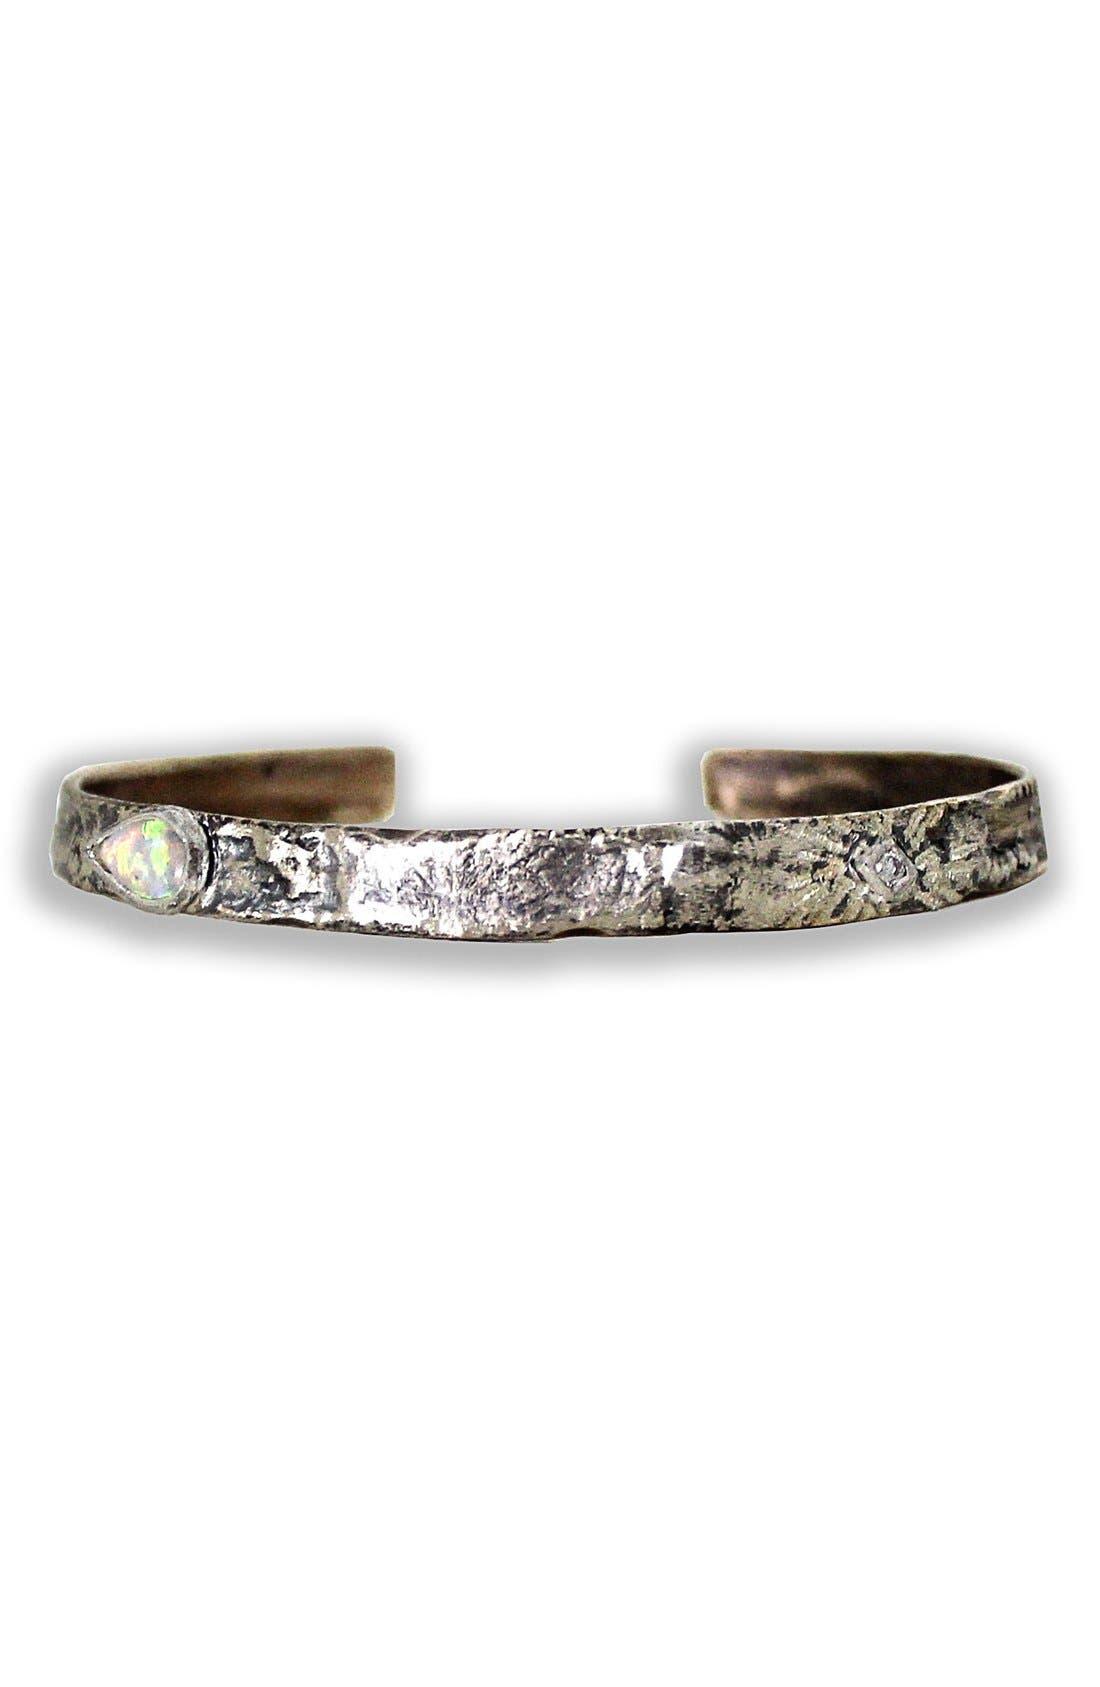 Main Image - Franny E Jewelry Opal & Diamond Cuff Bracelet